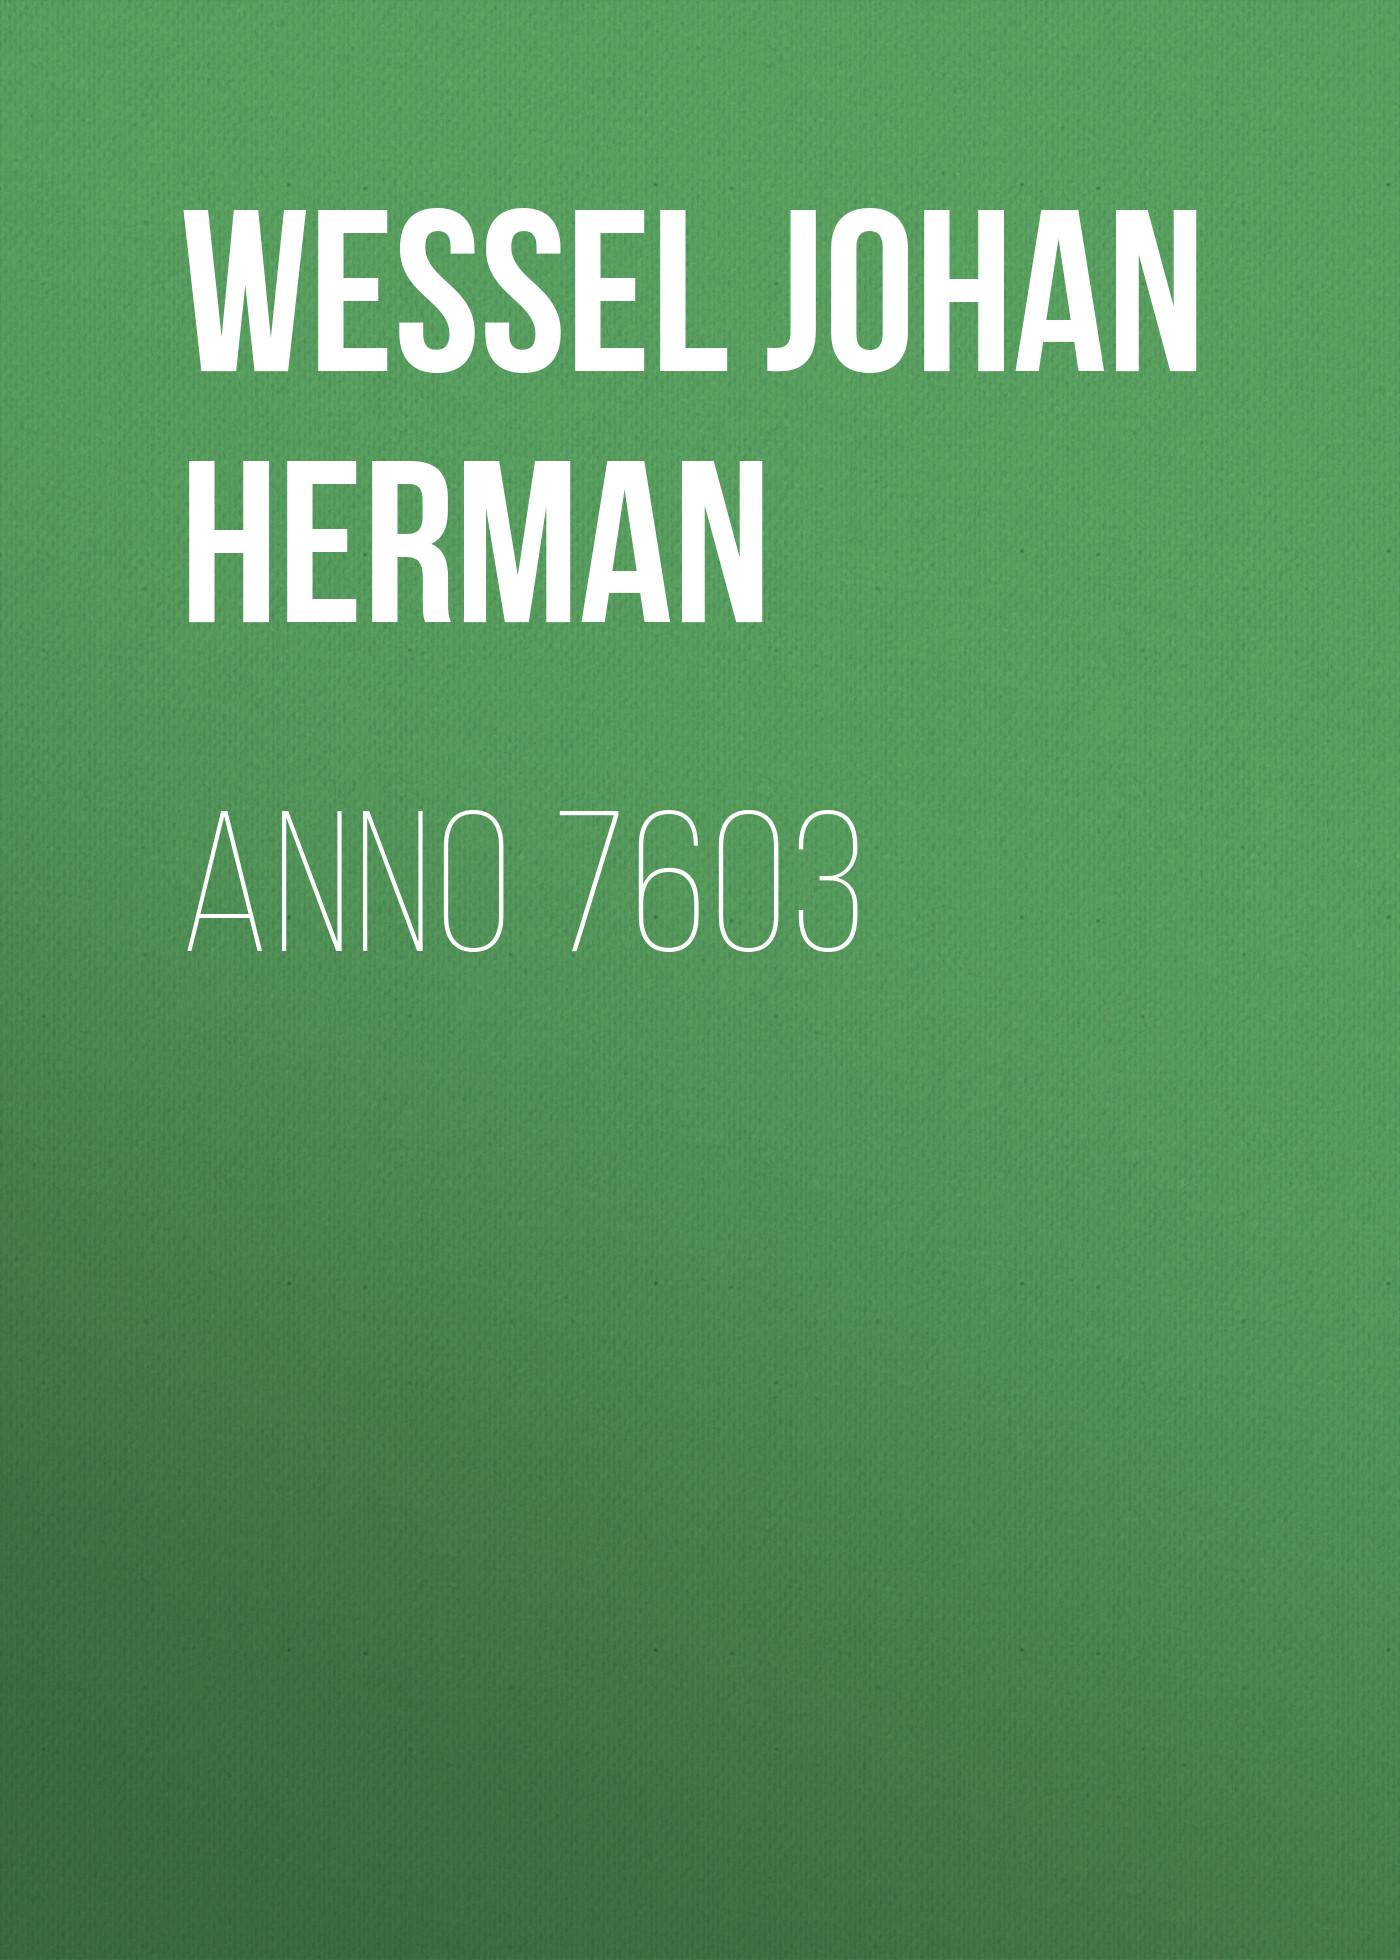 Wessel Johan Herman Anno 7603 herman johan robbers de vreemde plant